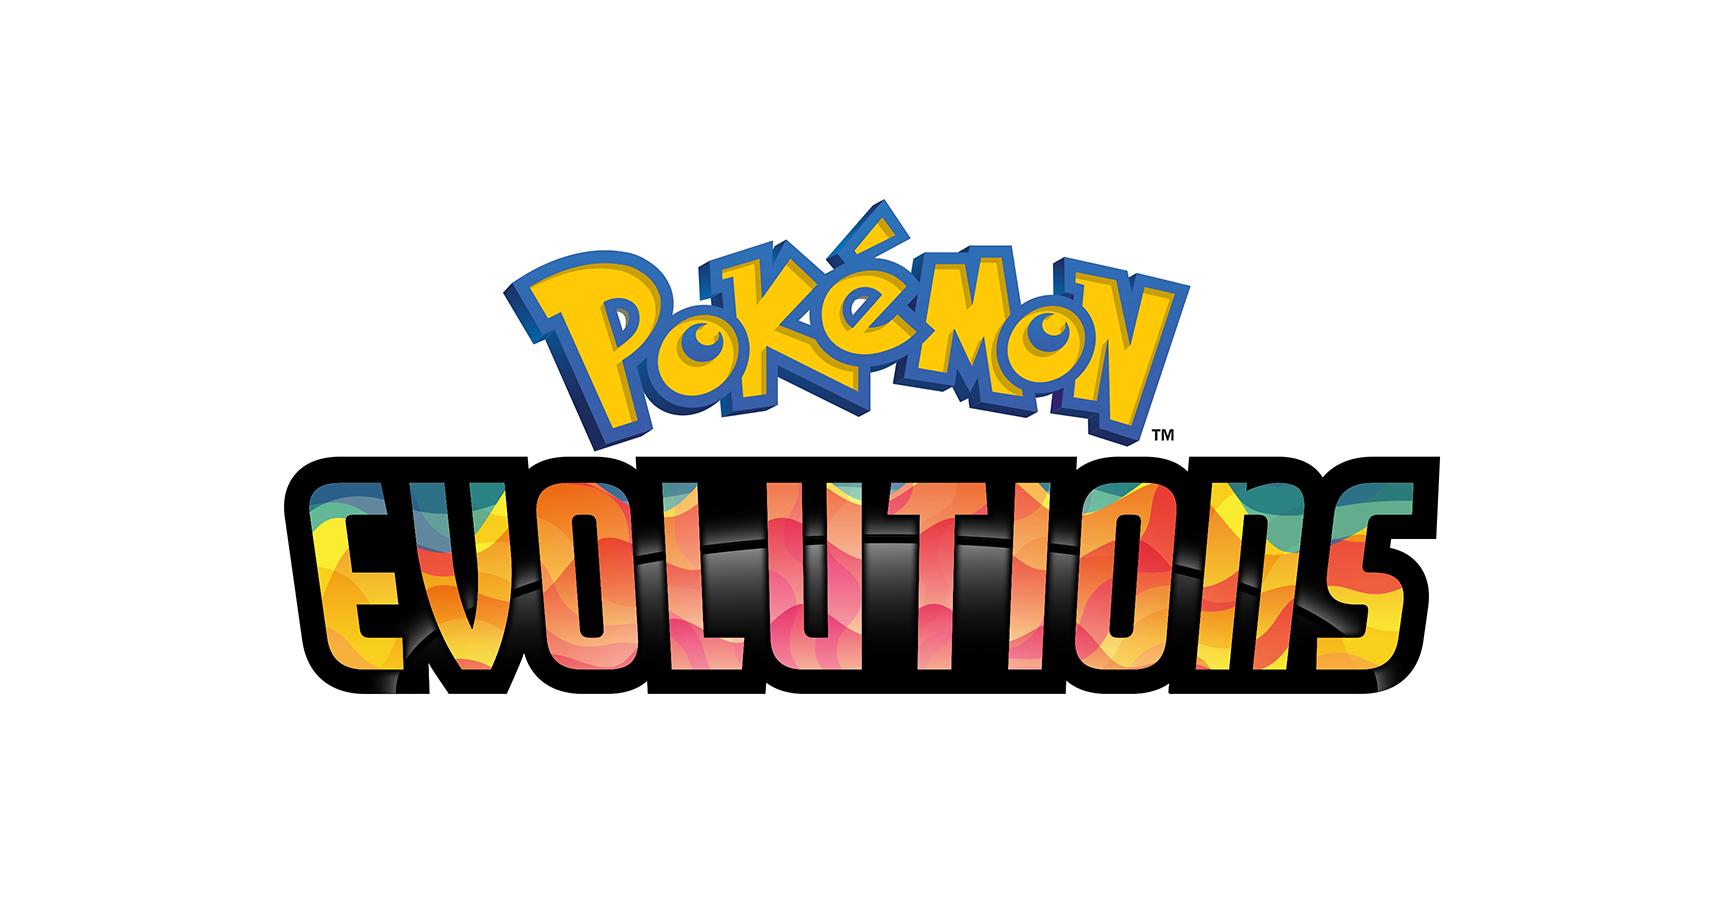 Pokémon Evolutions logo.png